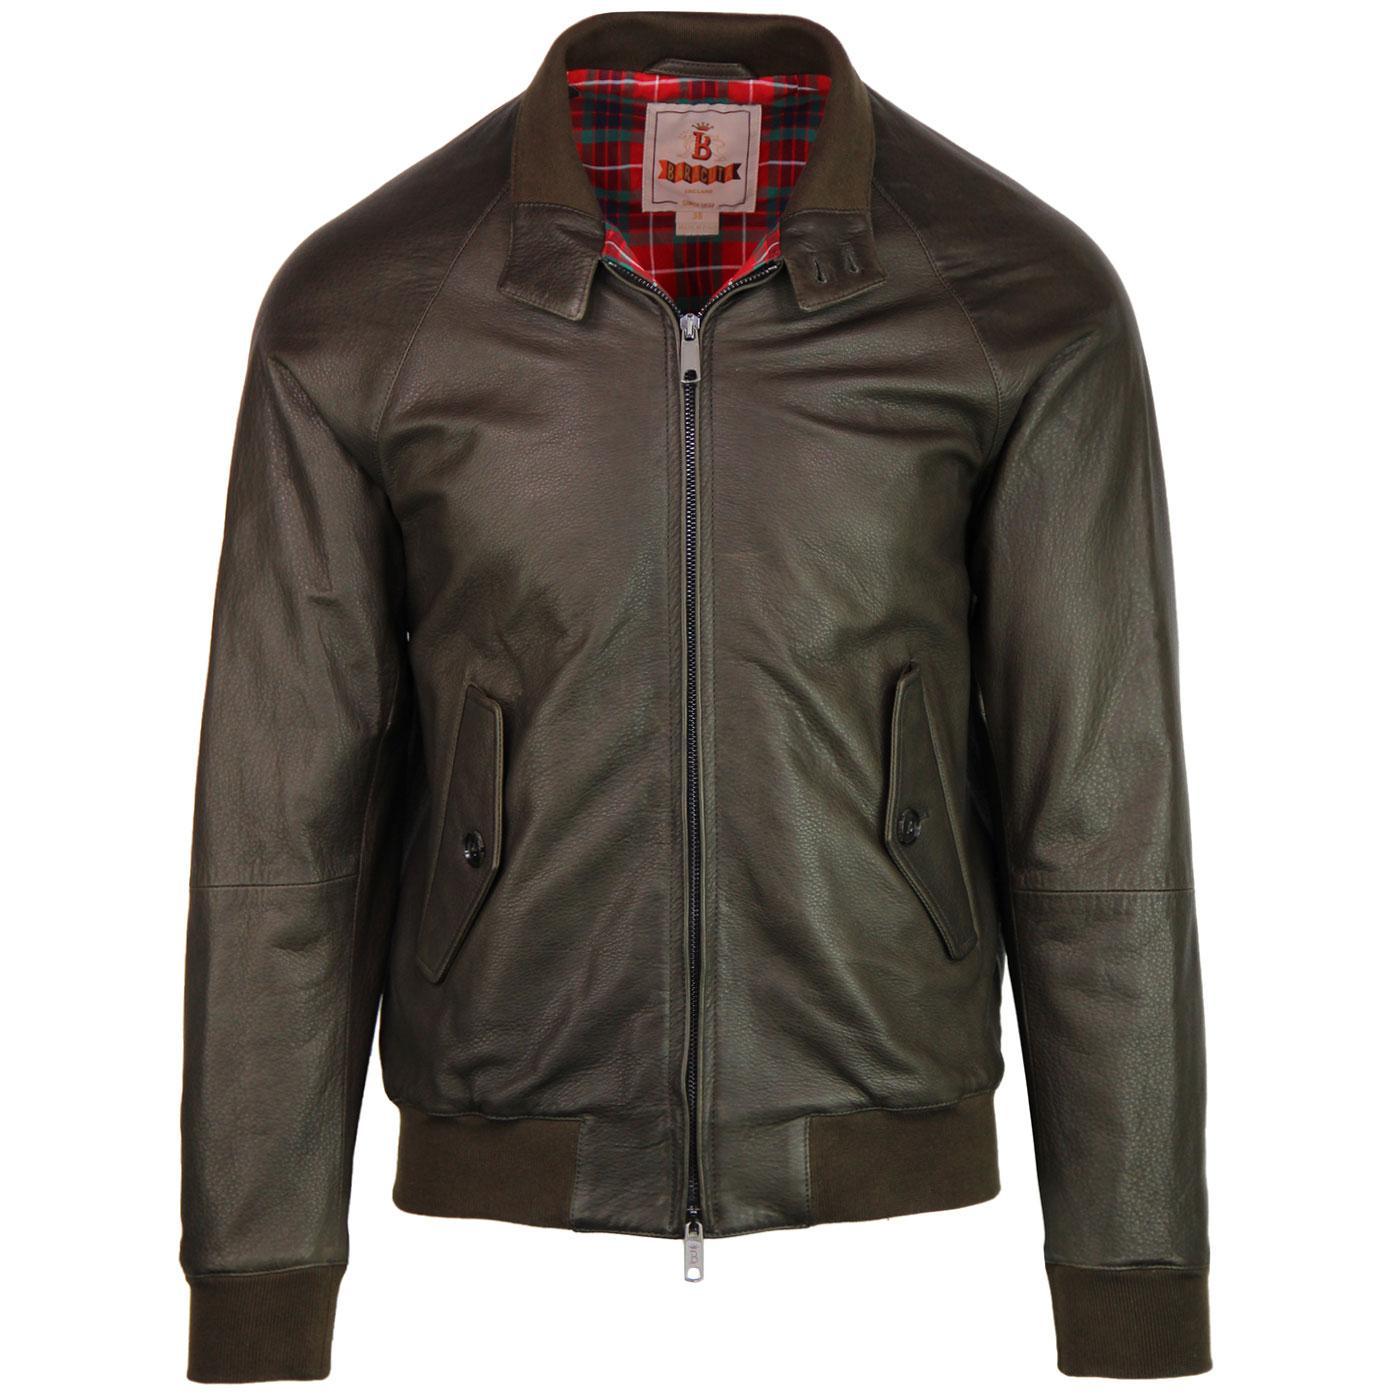 BARACUTA G9 Leather Mod Harrington Jacket (Taupe)